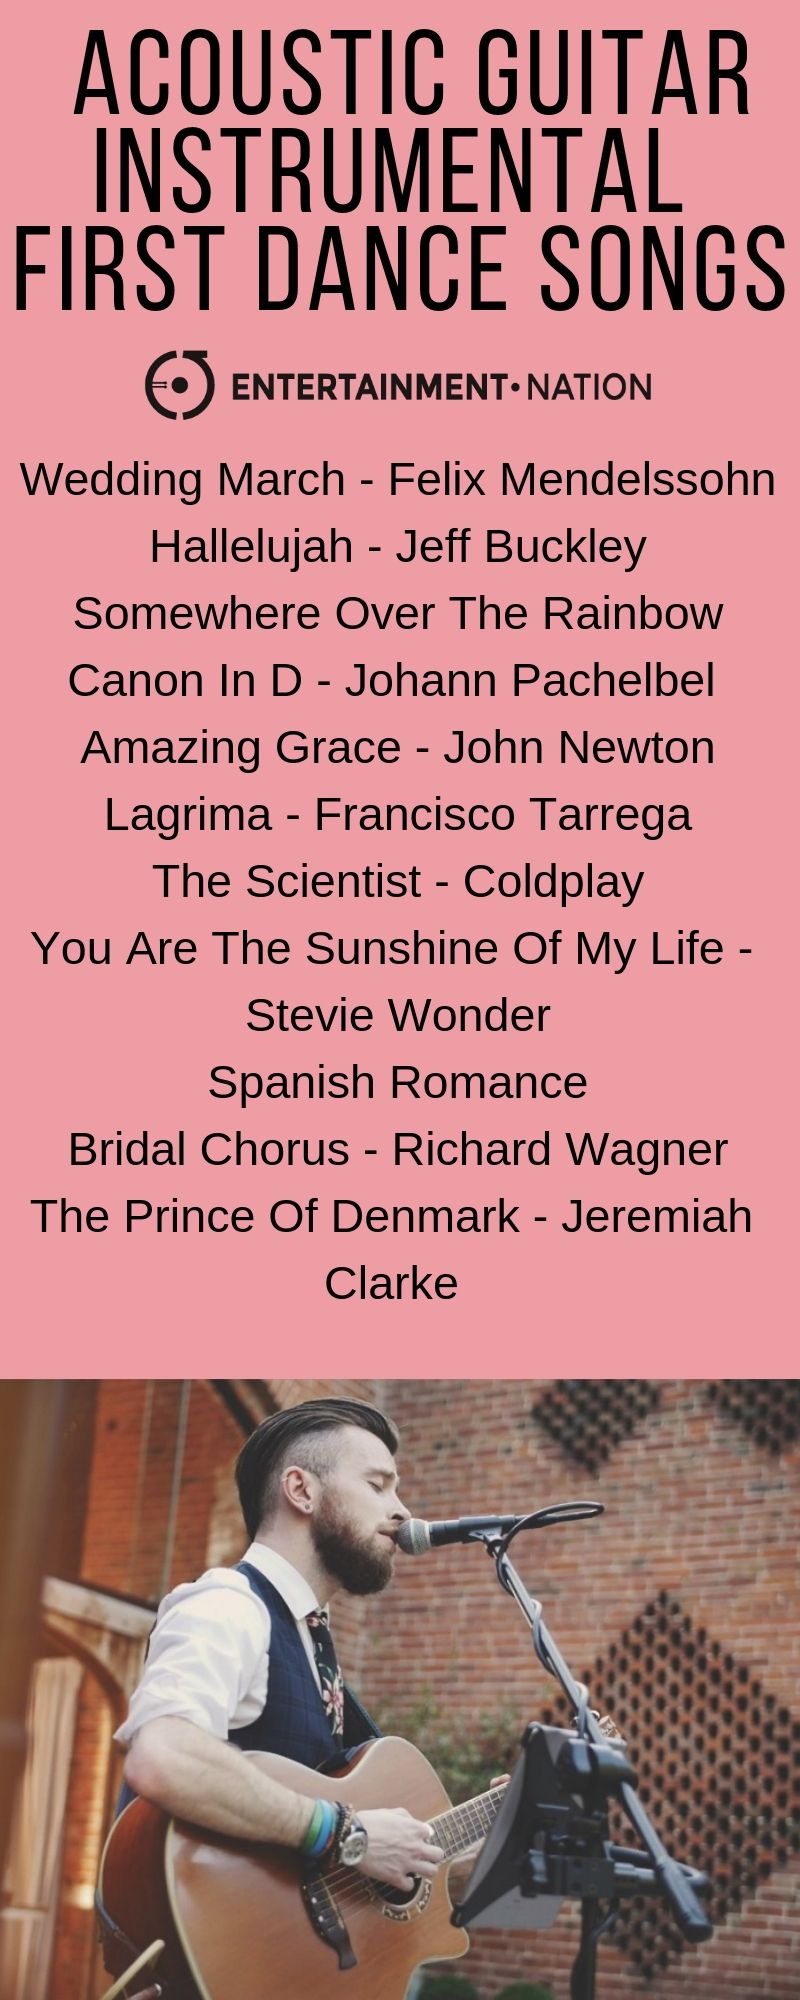 100 Romantic Acoustic Guitar Wedding Ceremony Songs